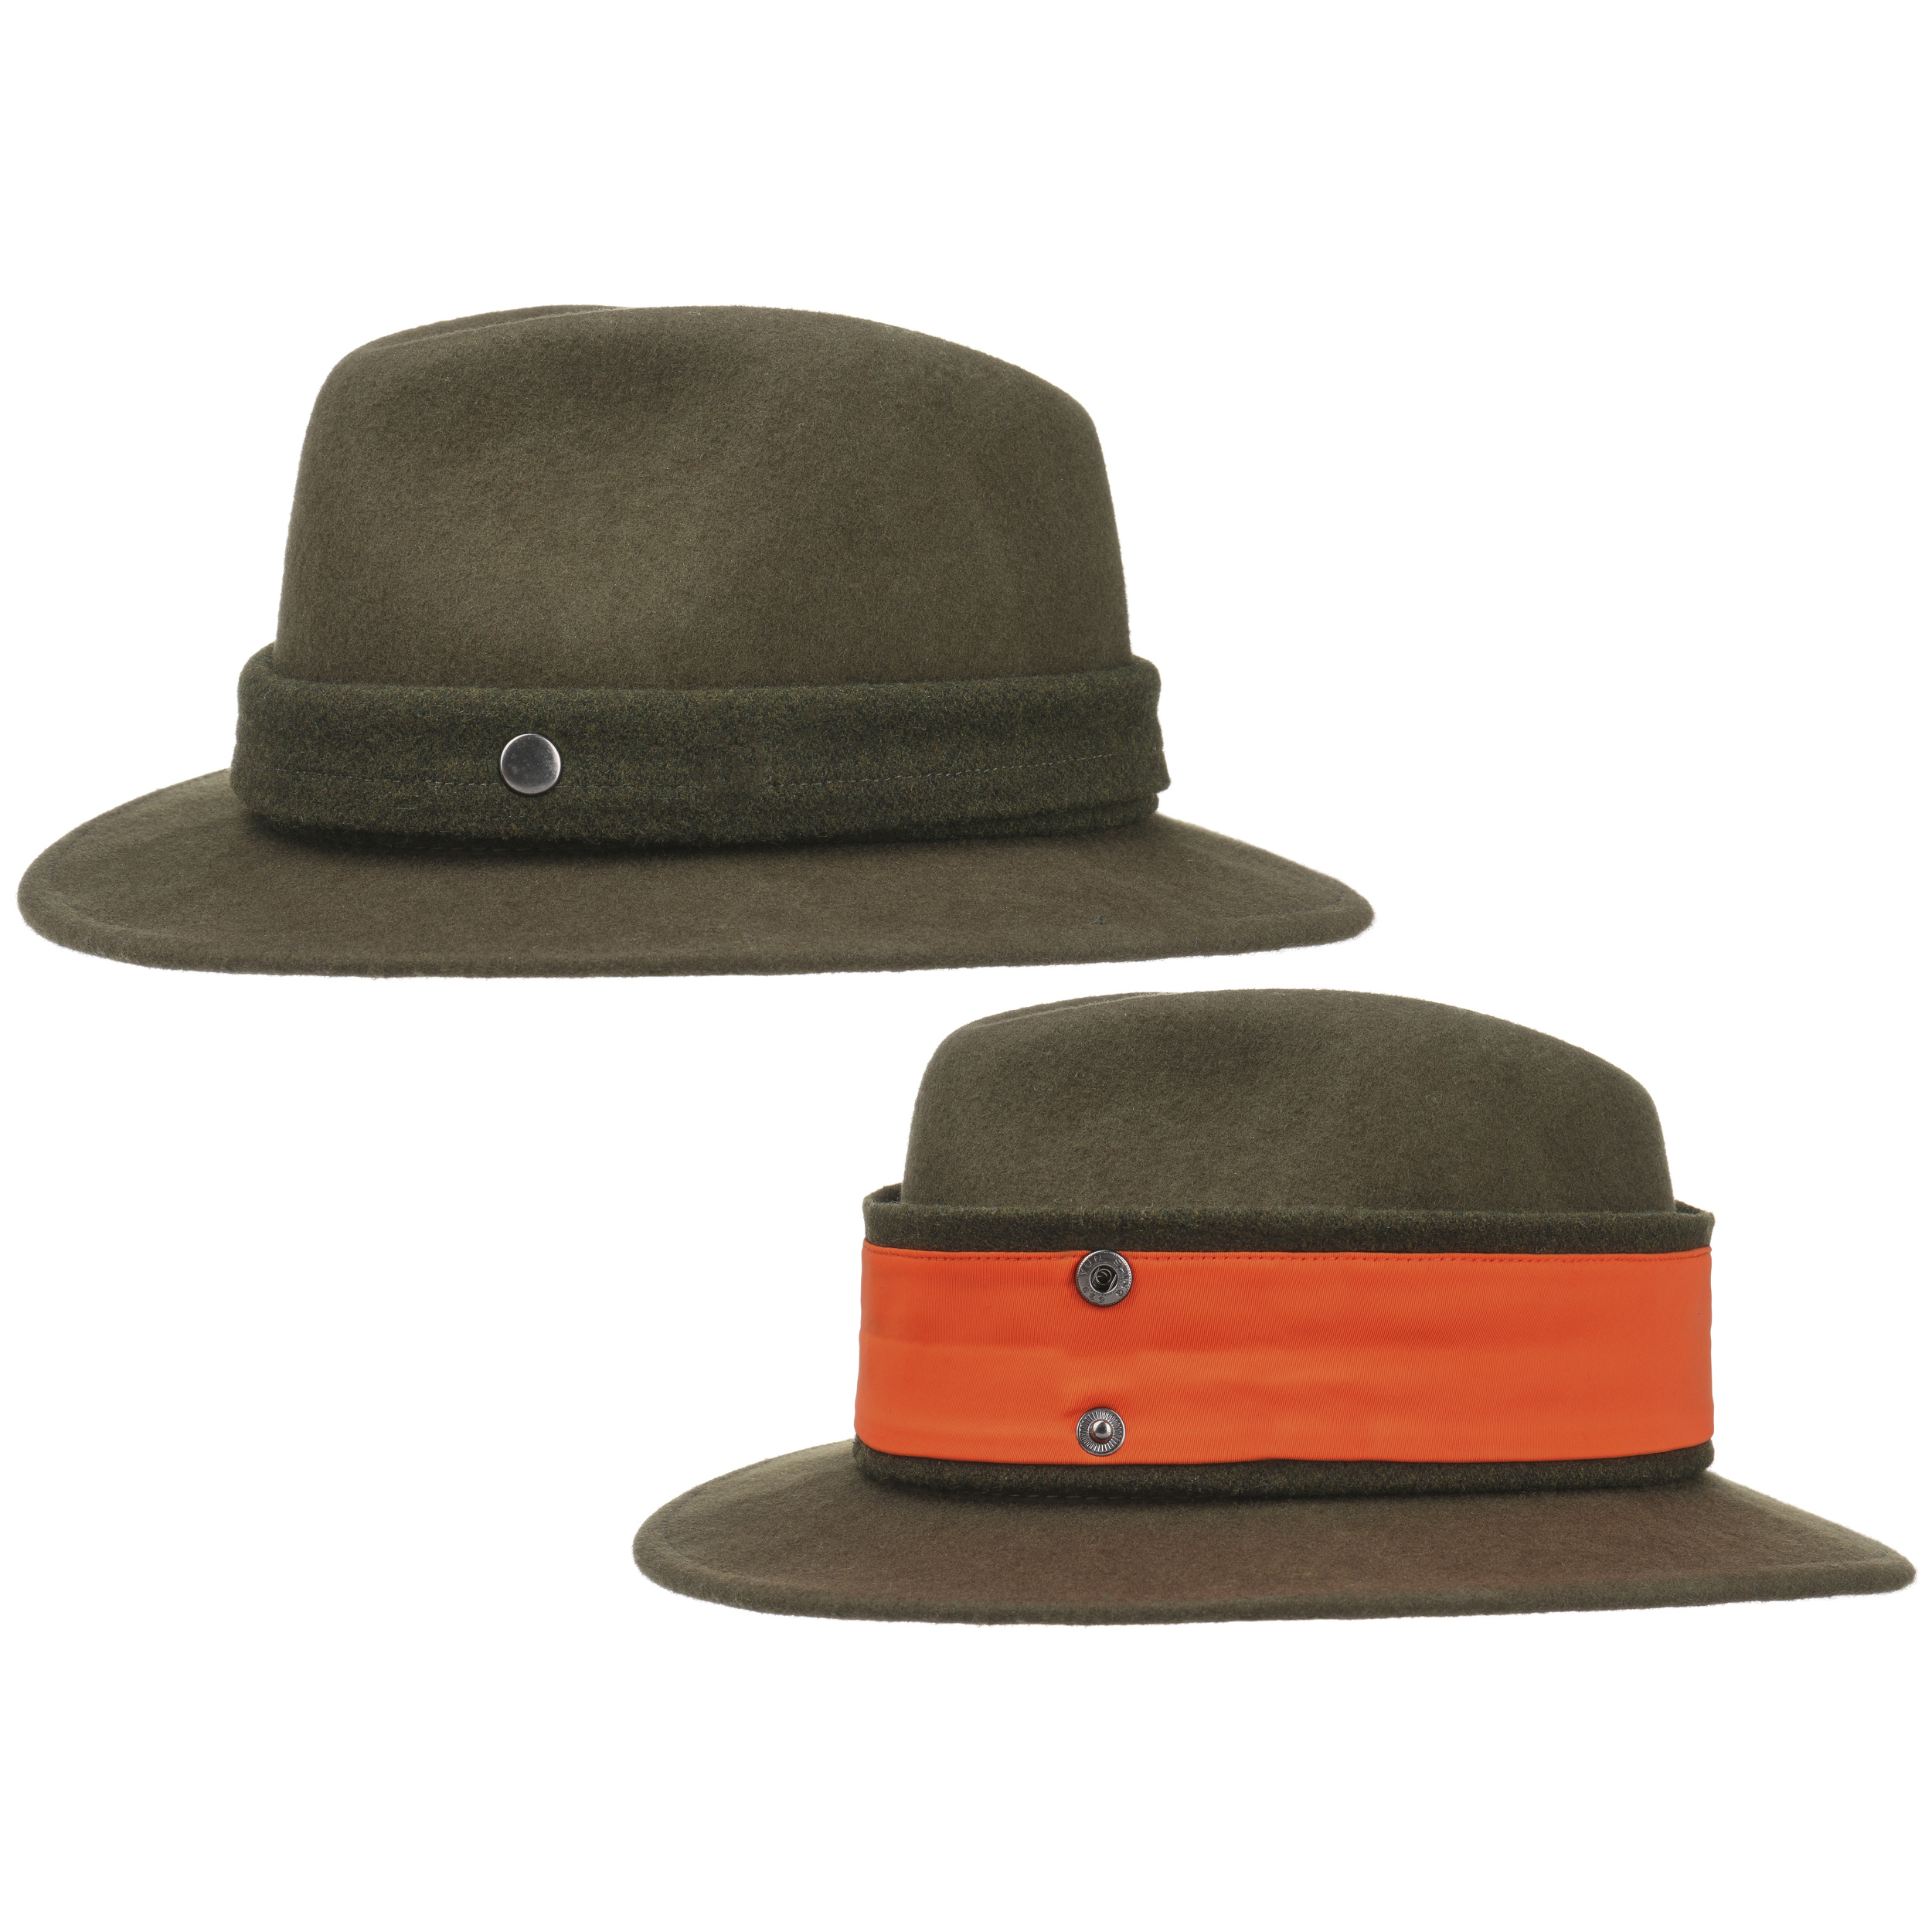 61c9a38e Sombrero para Cazar Hunting by Lierys